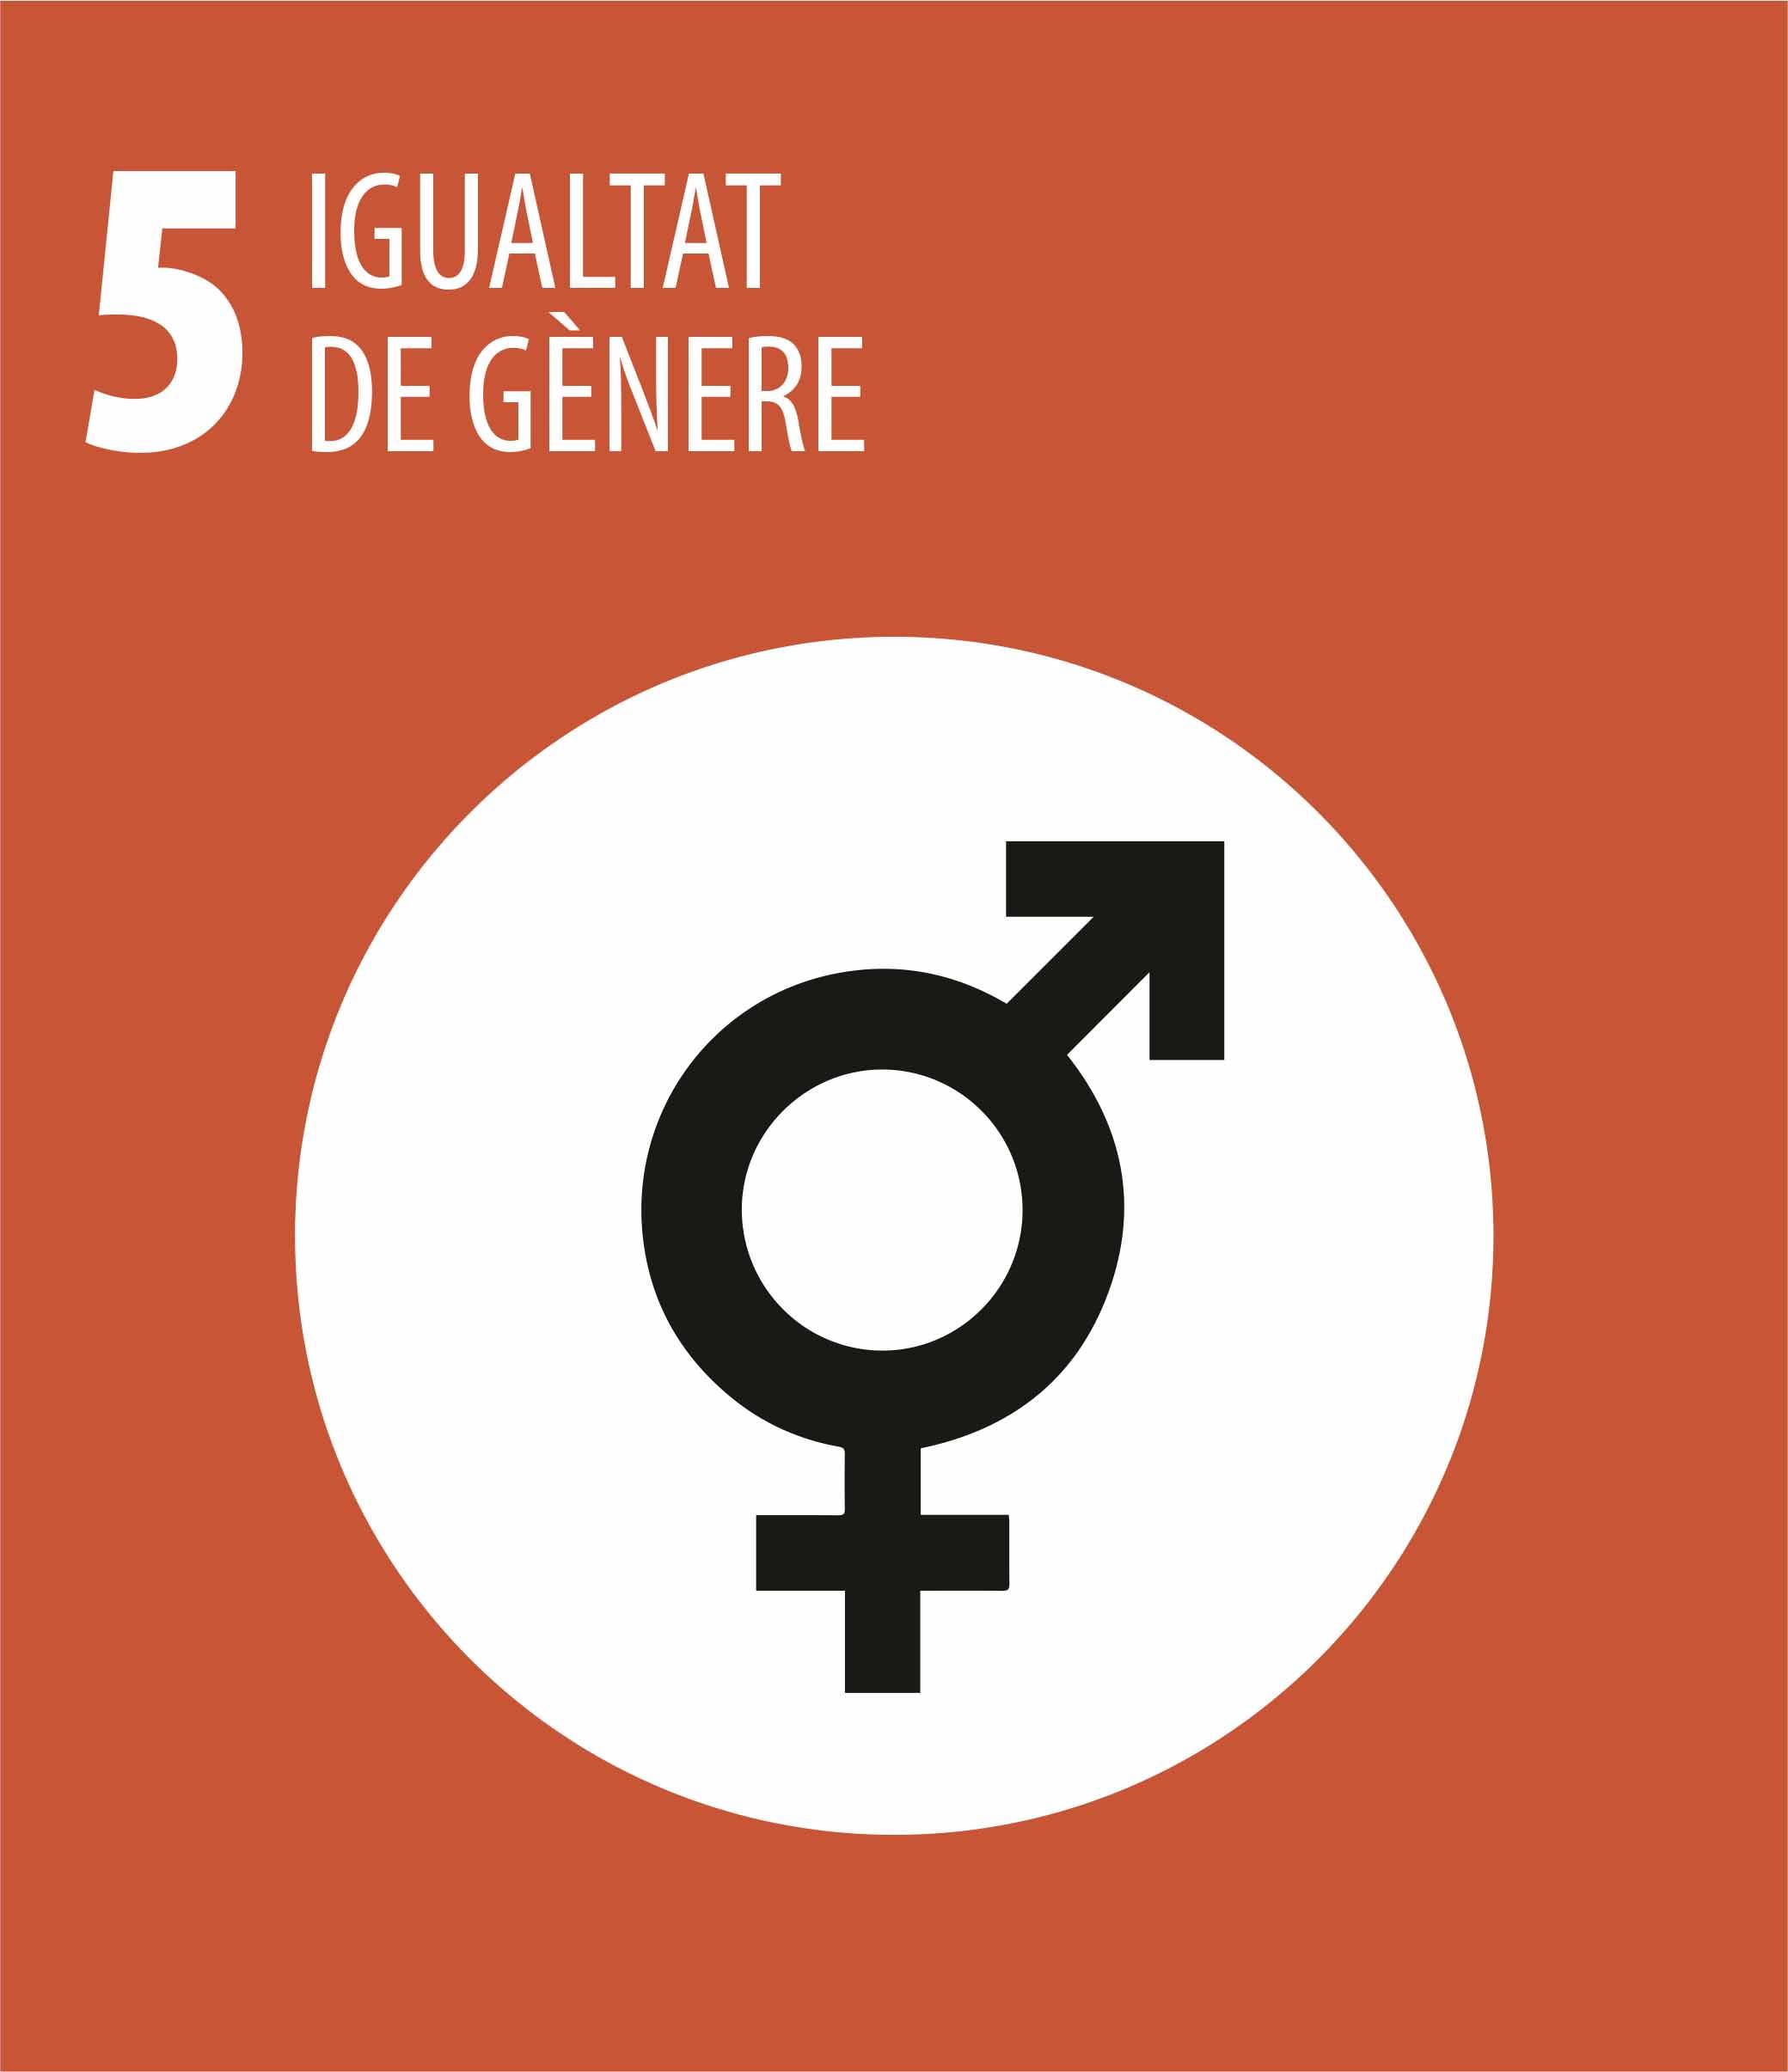 ODS 5 Igualtat genere